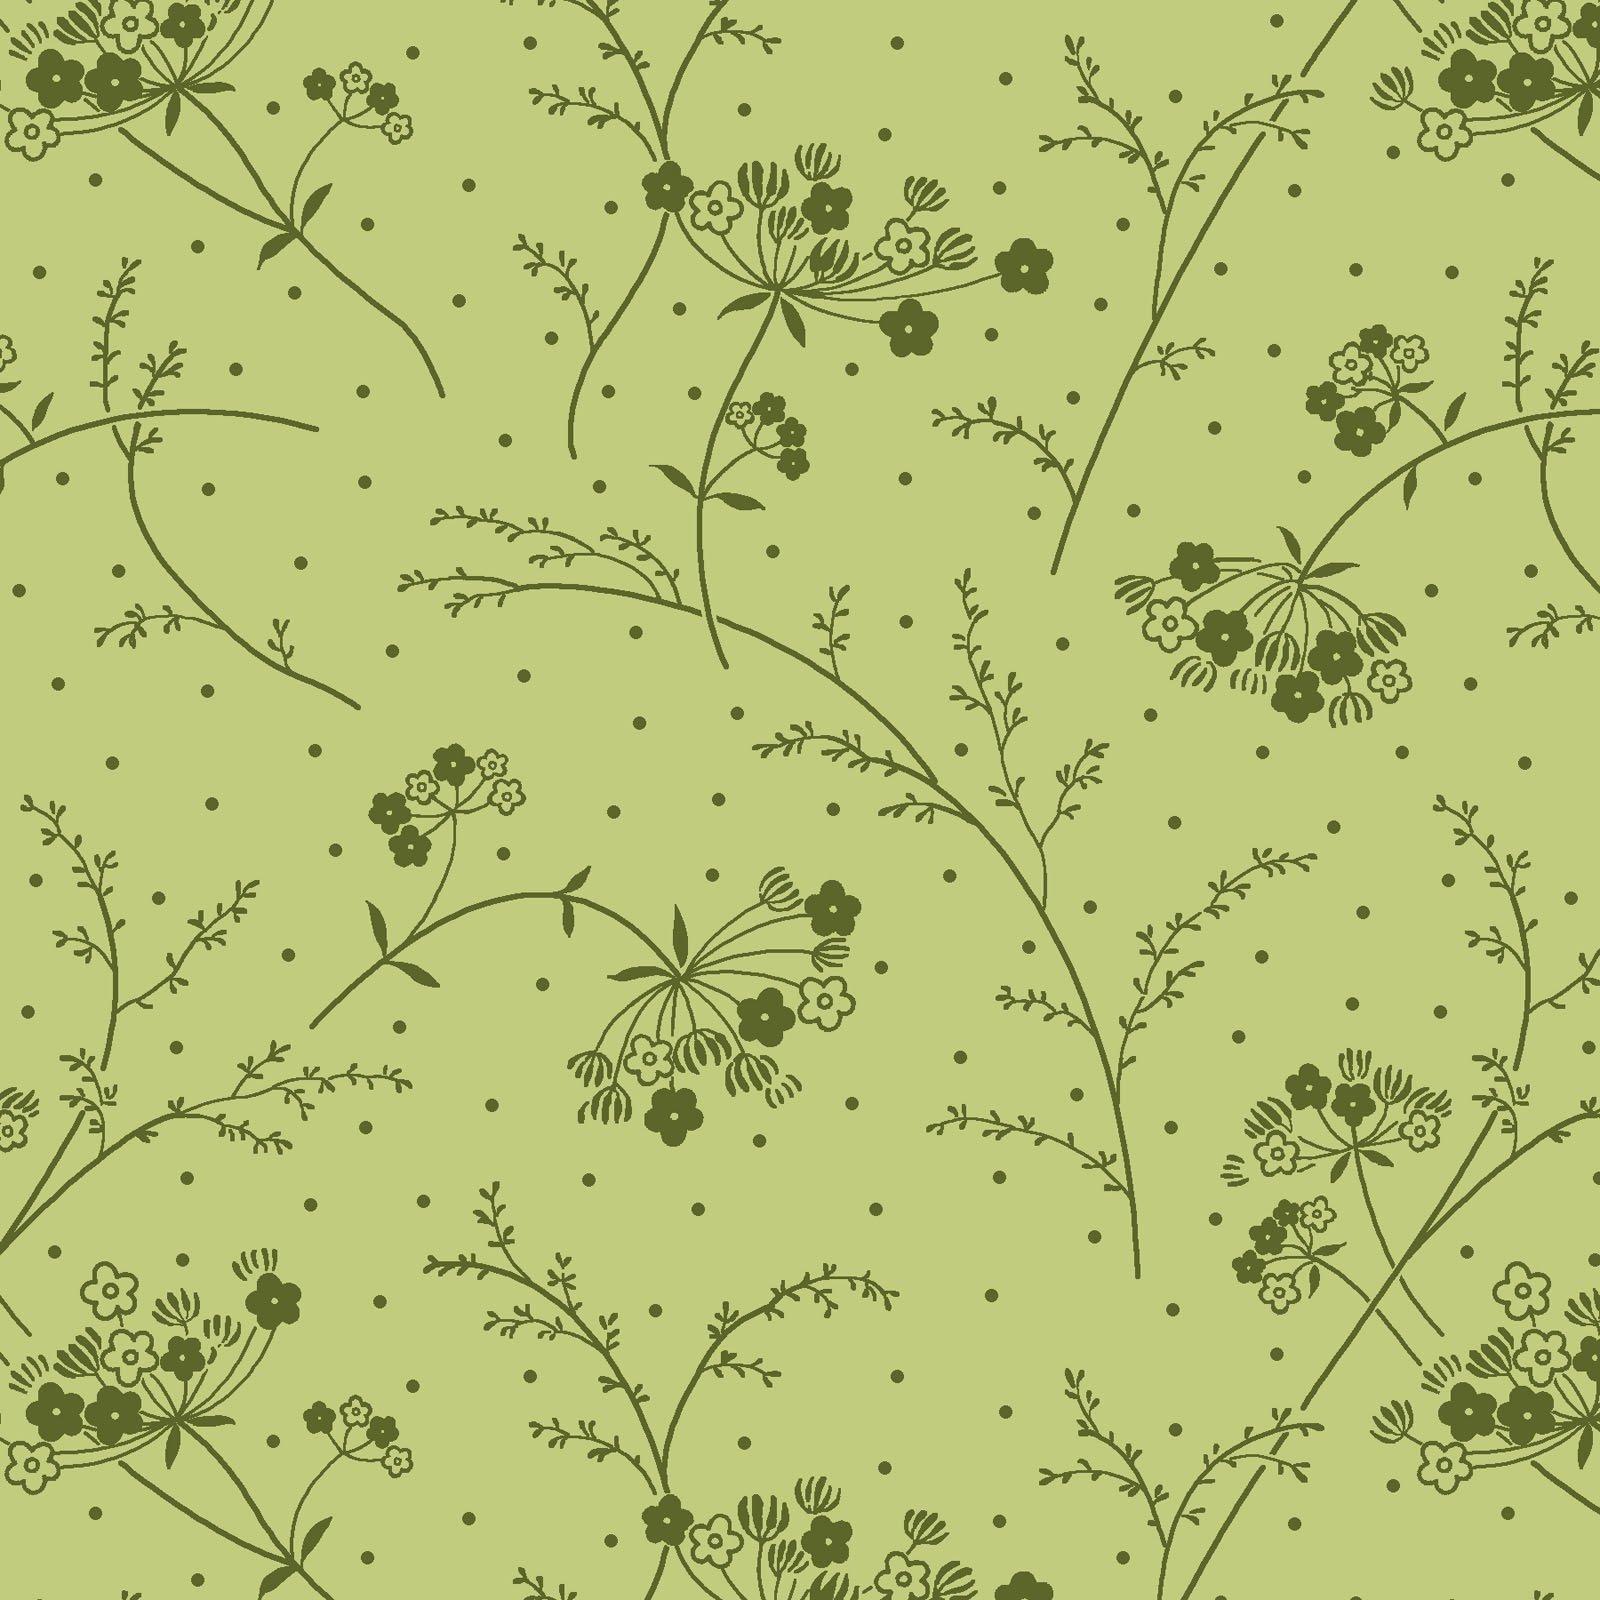 Kimberbell 108 Wide Back - Make a Wish - Green